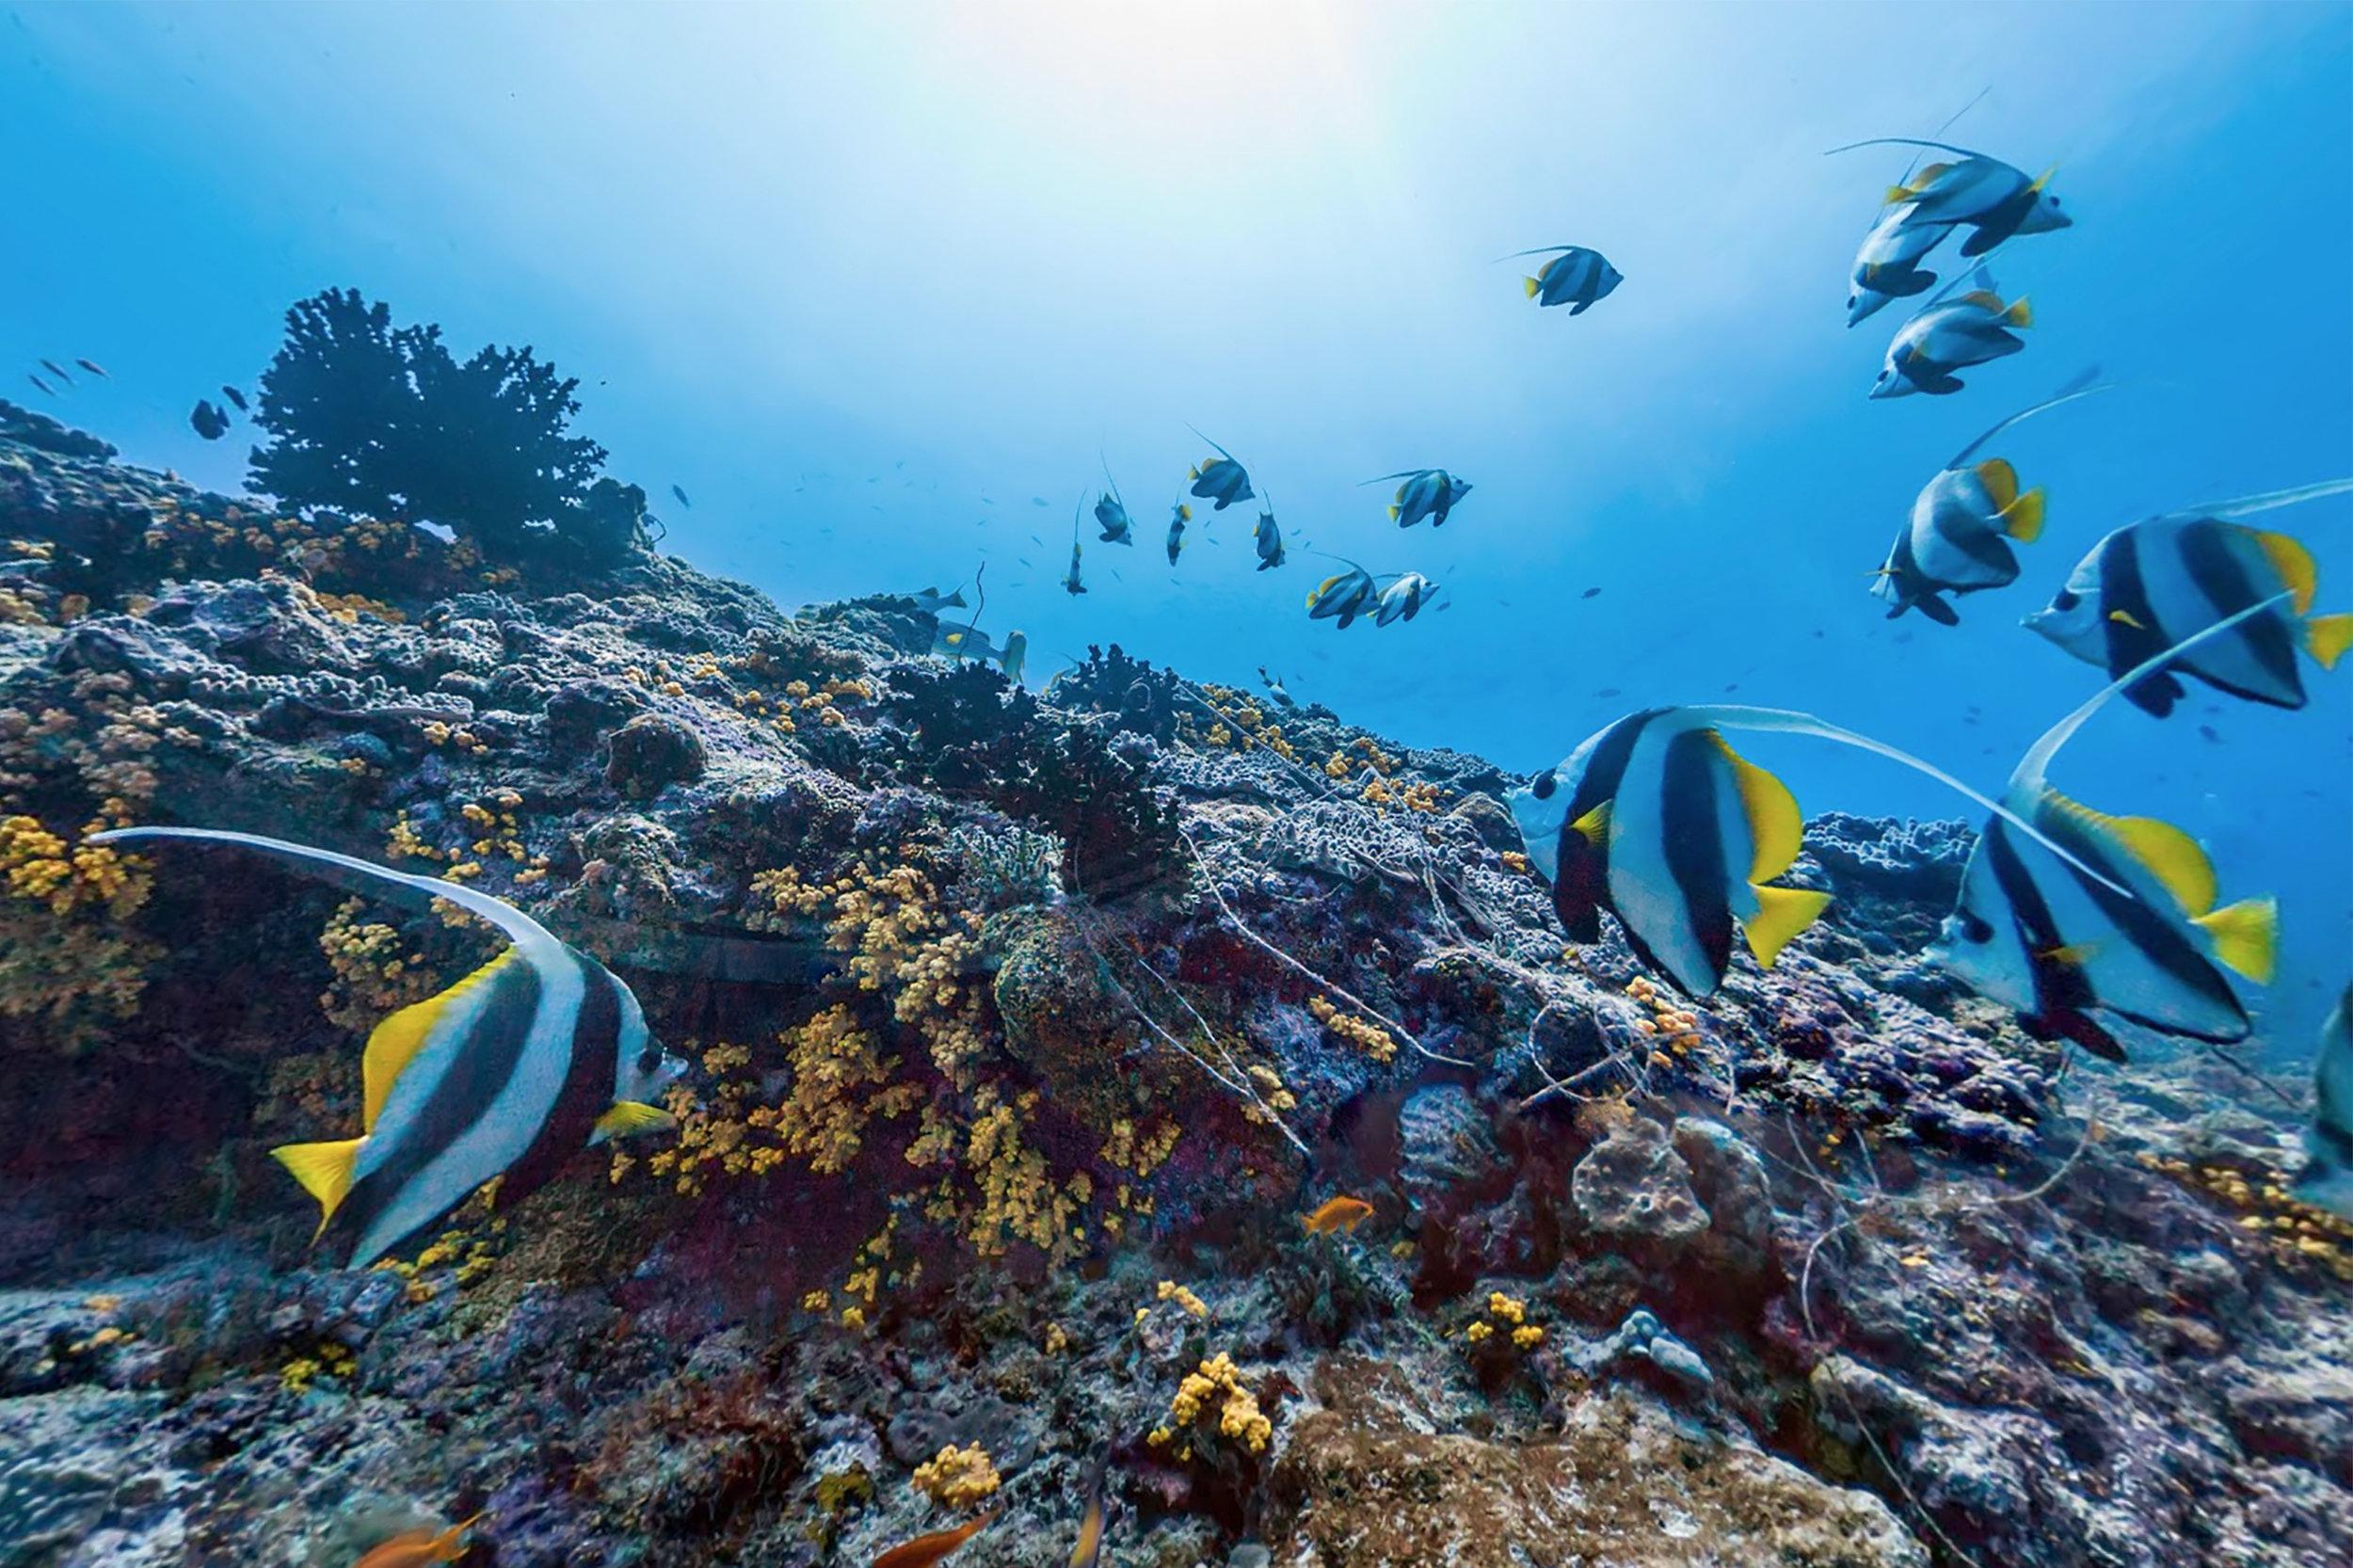 muli kandu, maldives CREDIT: THE OCEAN AGENCY / XLCSS